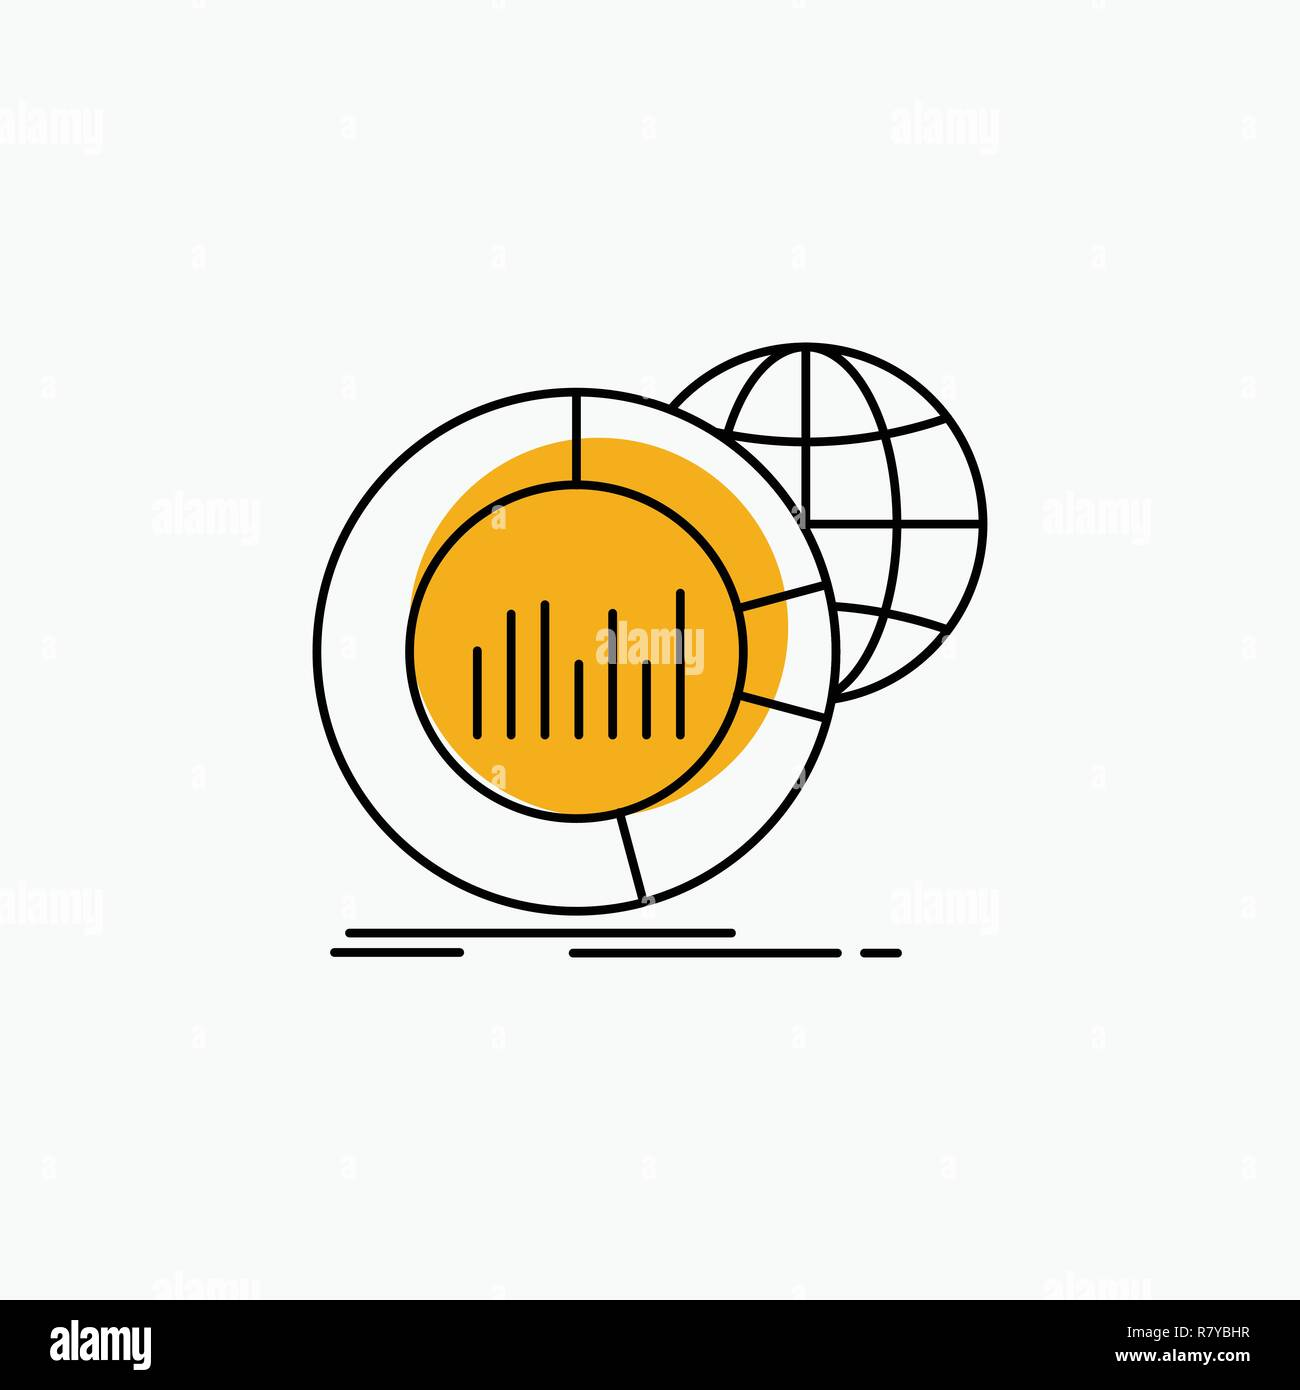 hight resolution of big chart data world infographic line icon